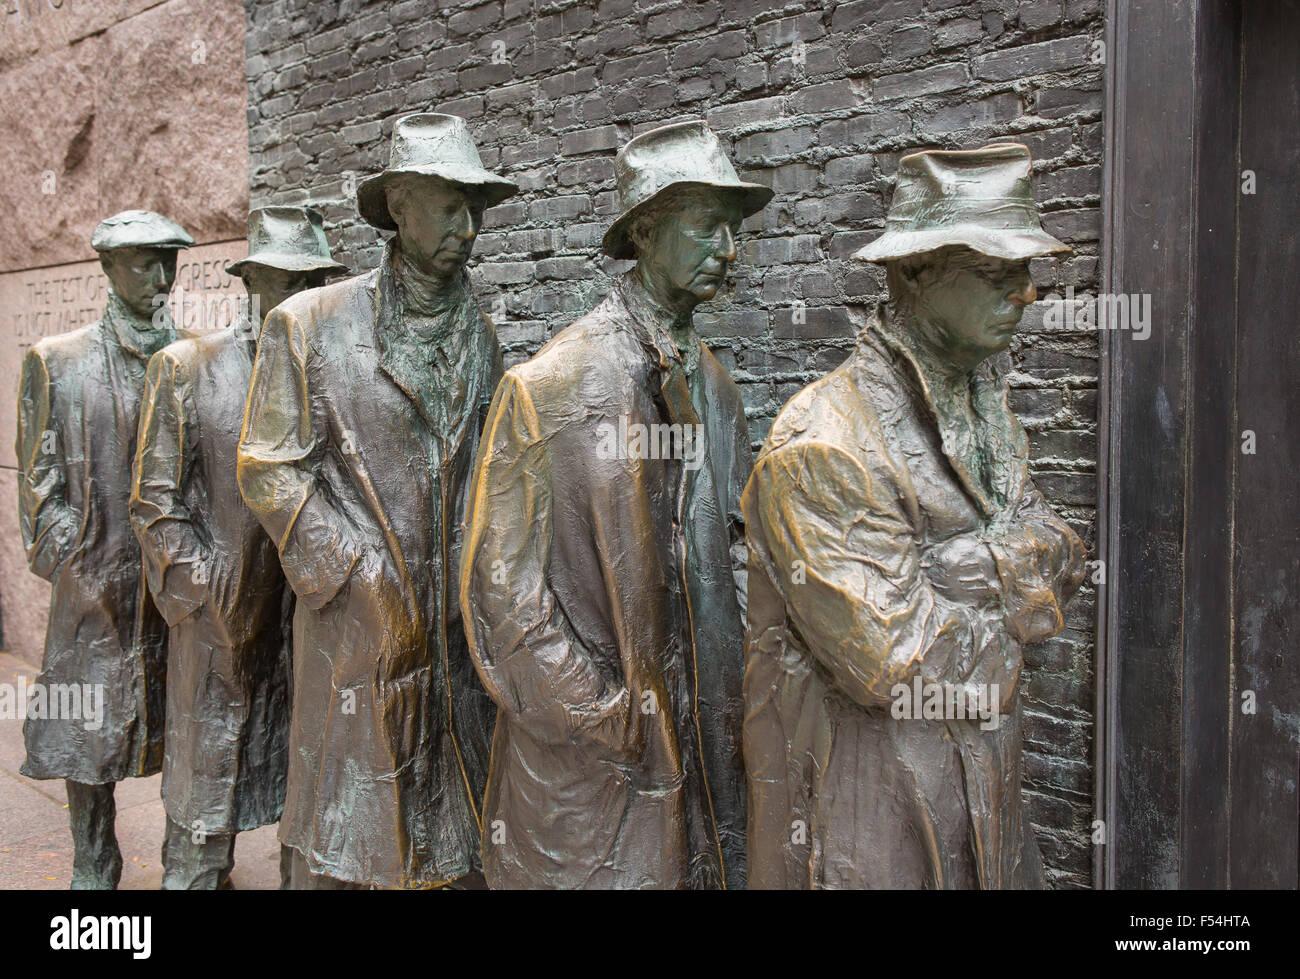 WASHINGTON, DC, USA - Franklin Roosevelt Memorial. Bronze sculpture of depression bread line. - Stock Image